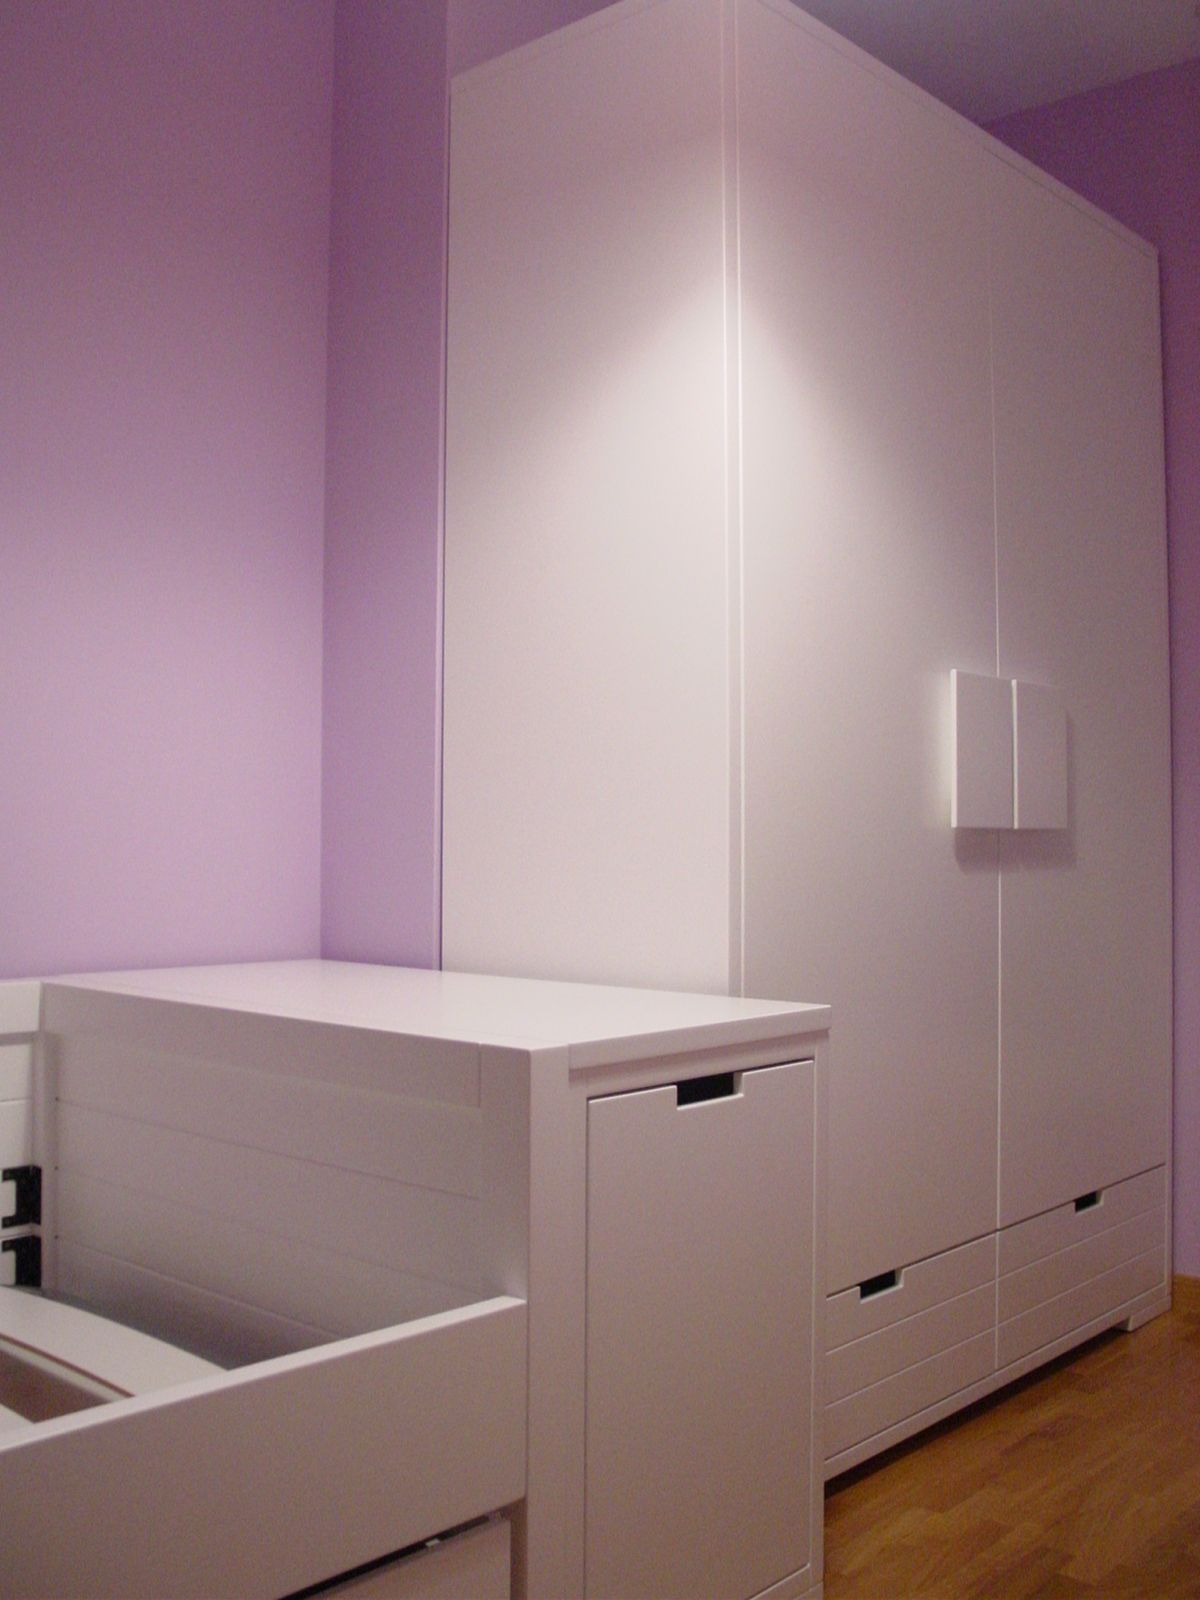 Habitaci n juvenil muy completa y bien aprovechada for Bona nit muebles